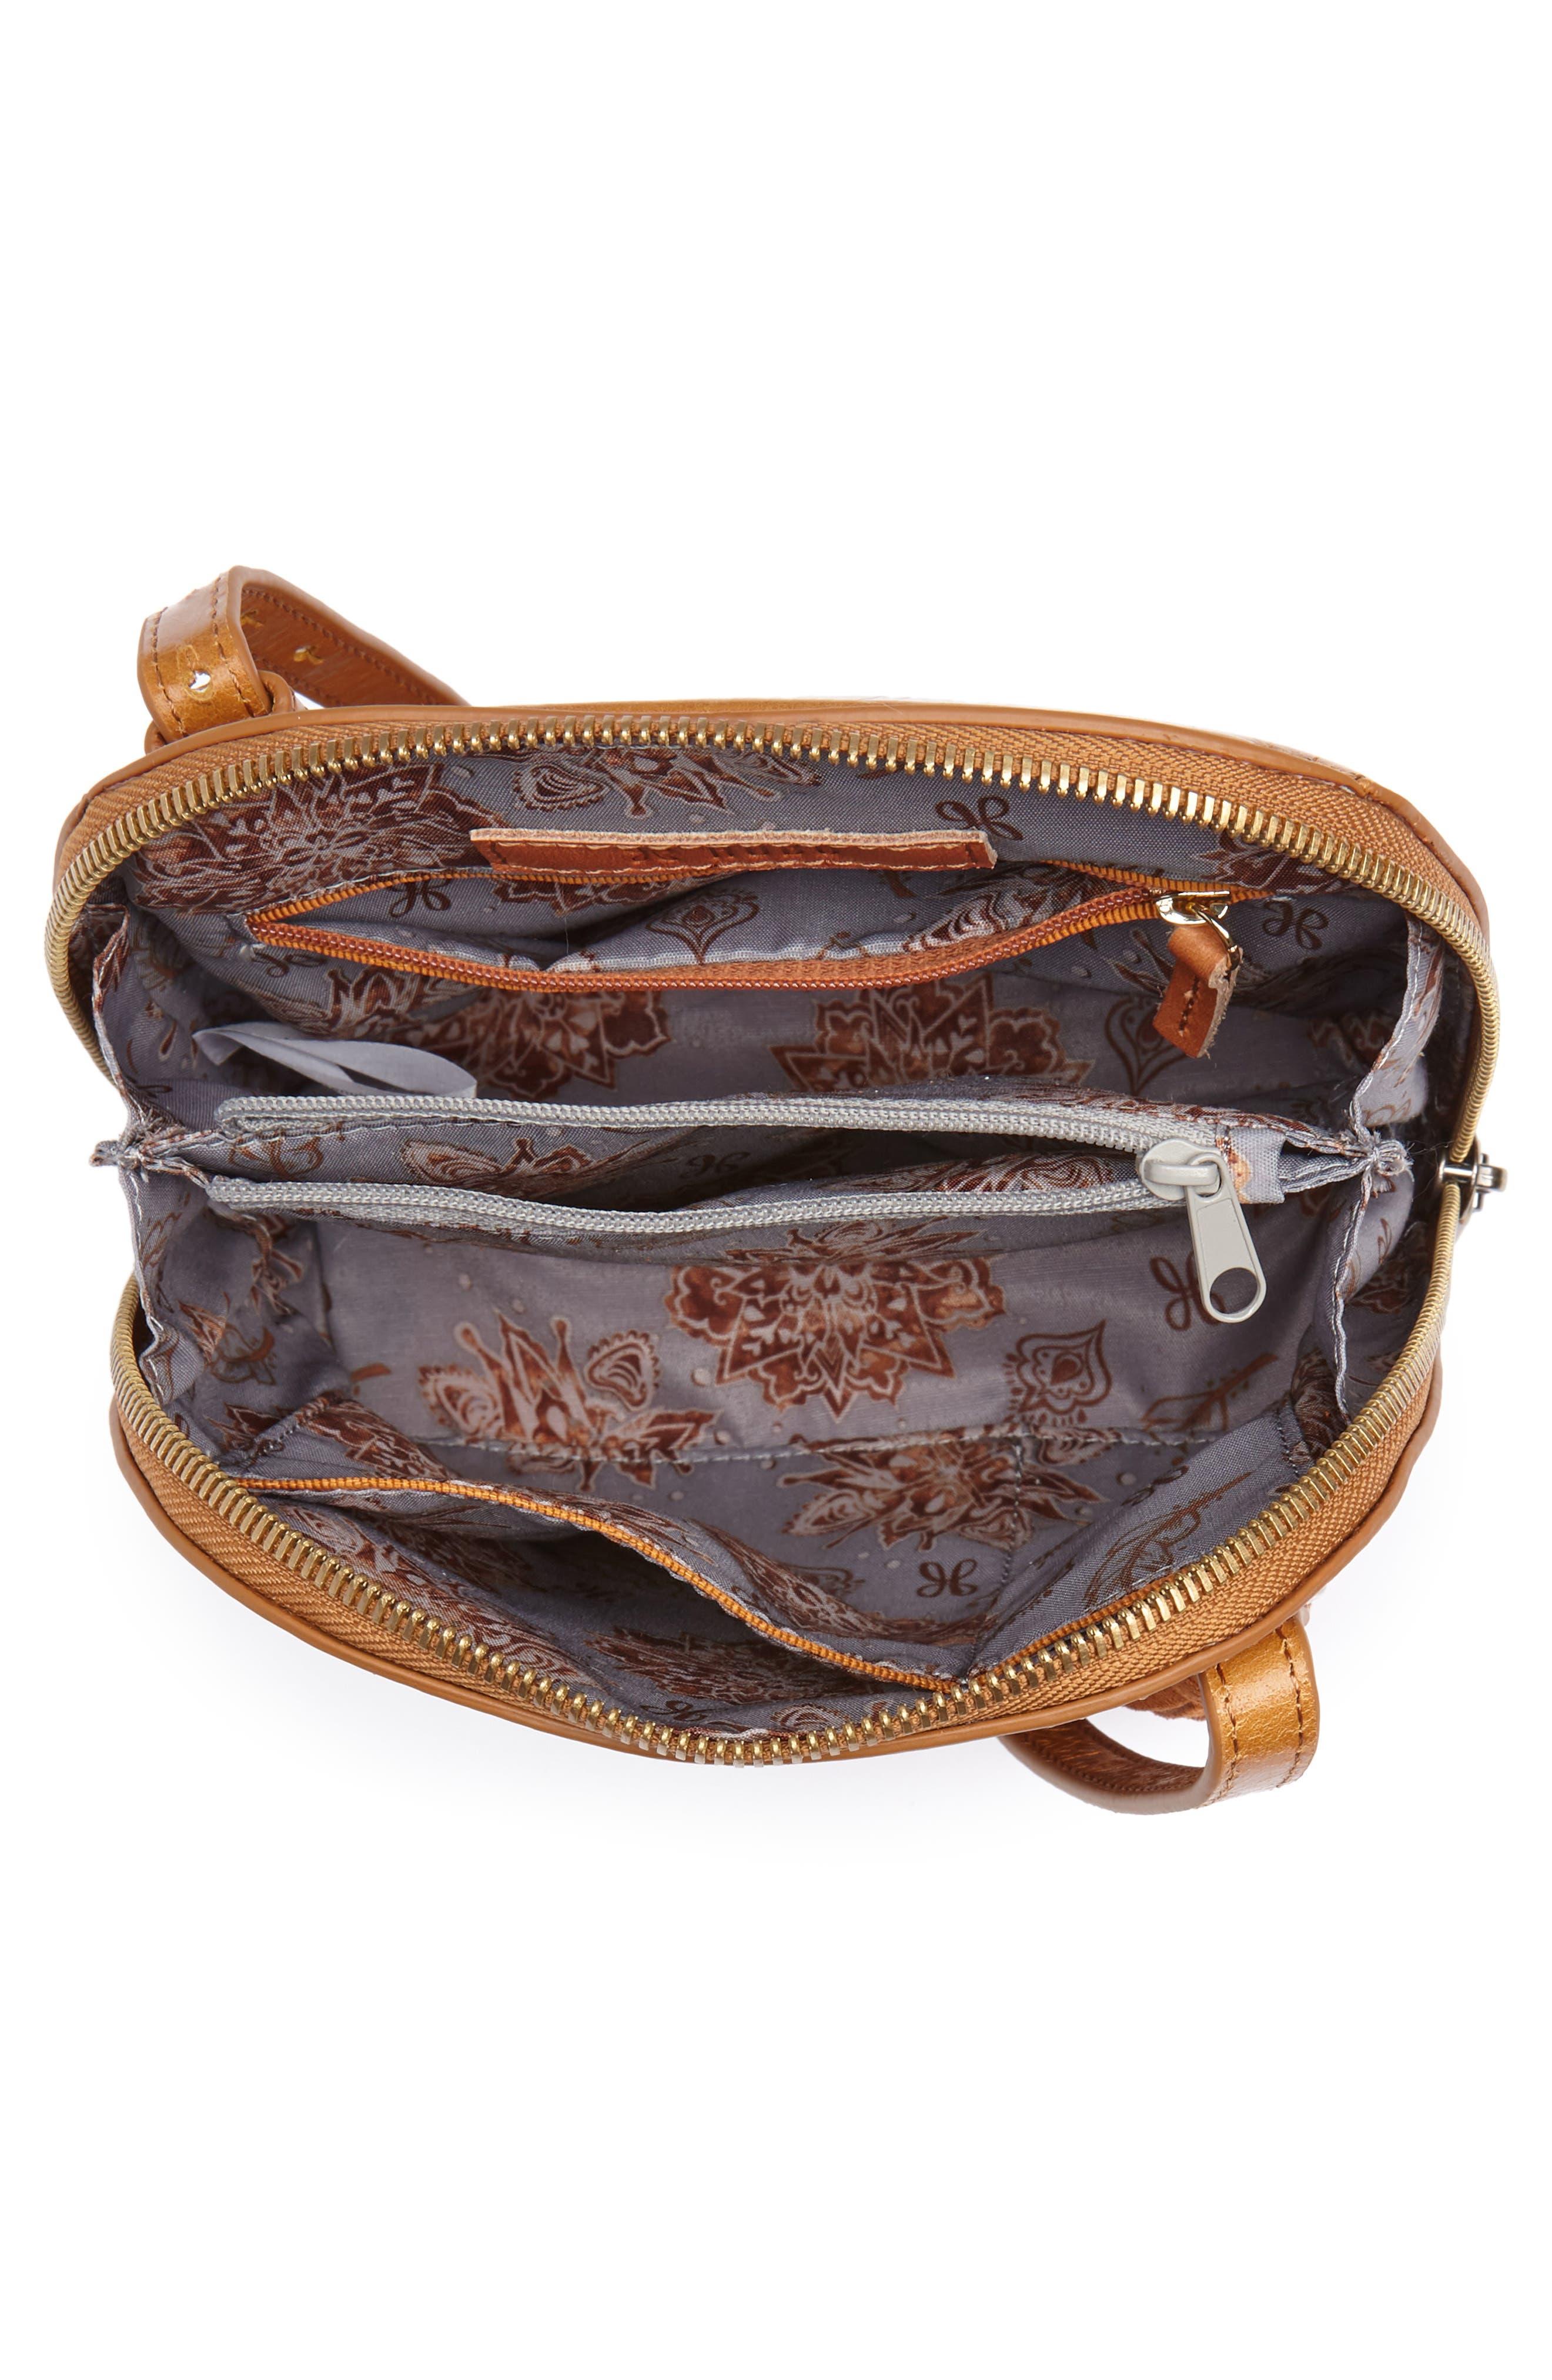 HOBO,                             Nash Floral Crossbody Bag,                             Alternate thumbnail 4, color,                             212